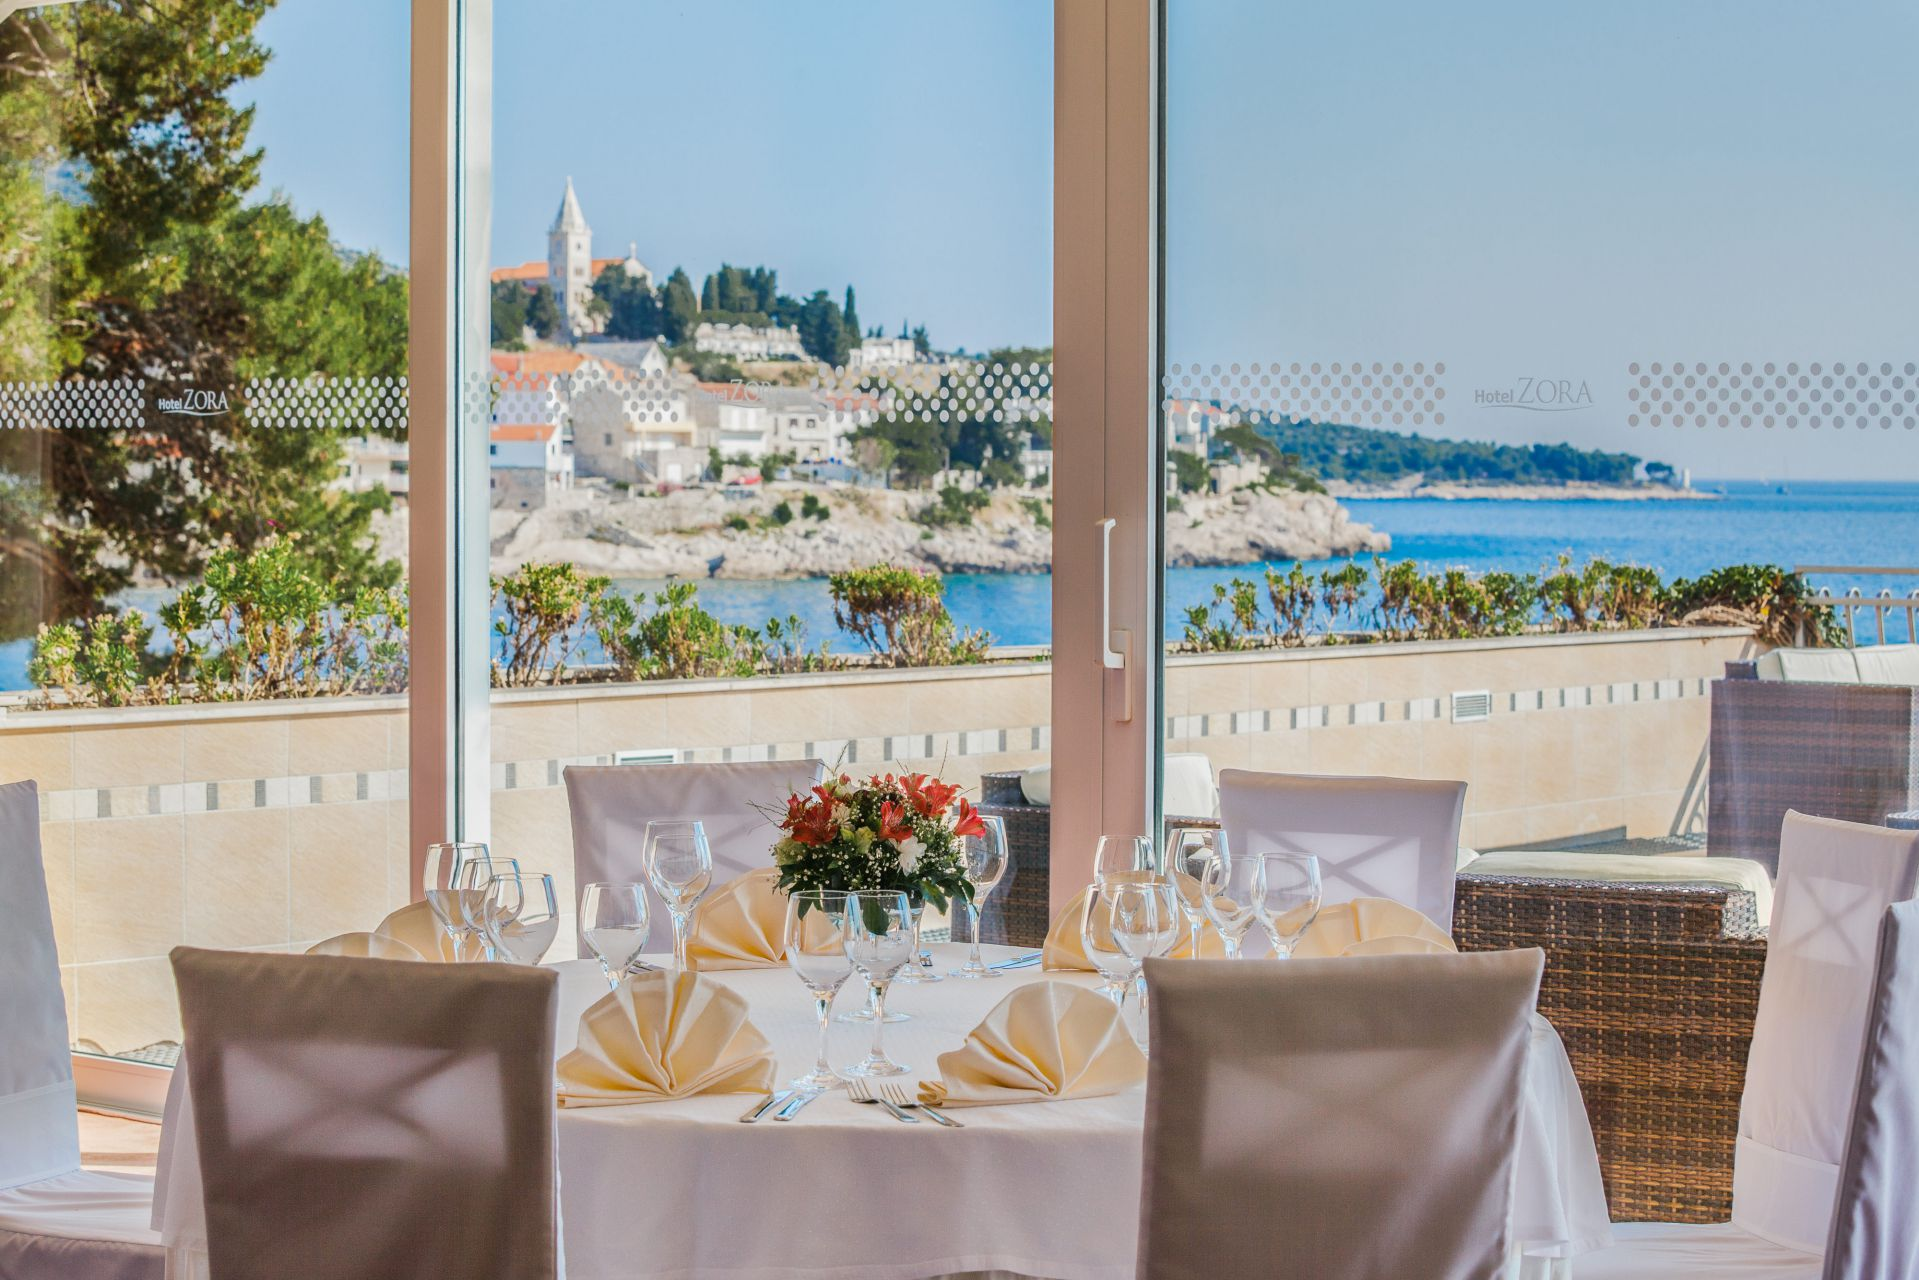 wedding piano bar 02 14639669978 o 1 - Zora Hotel